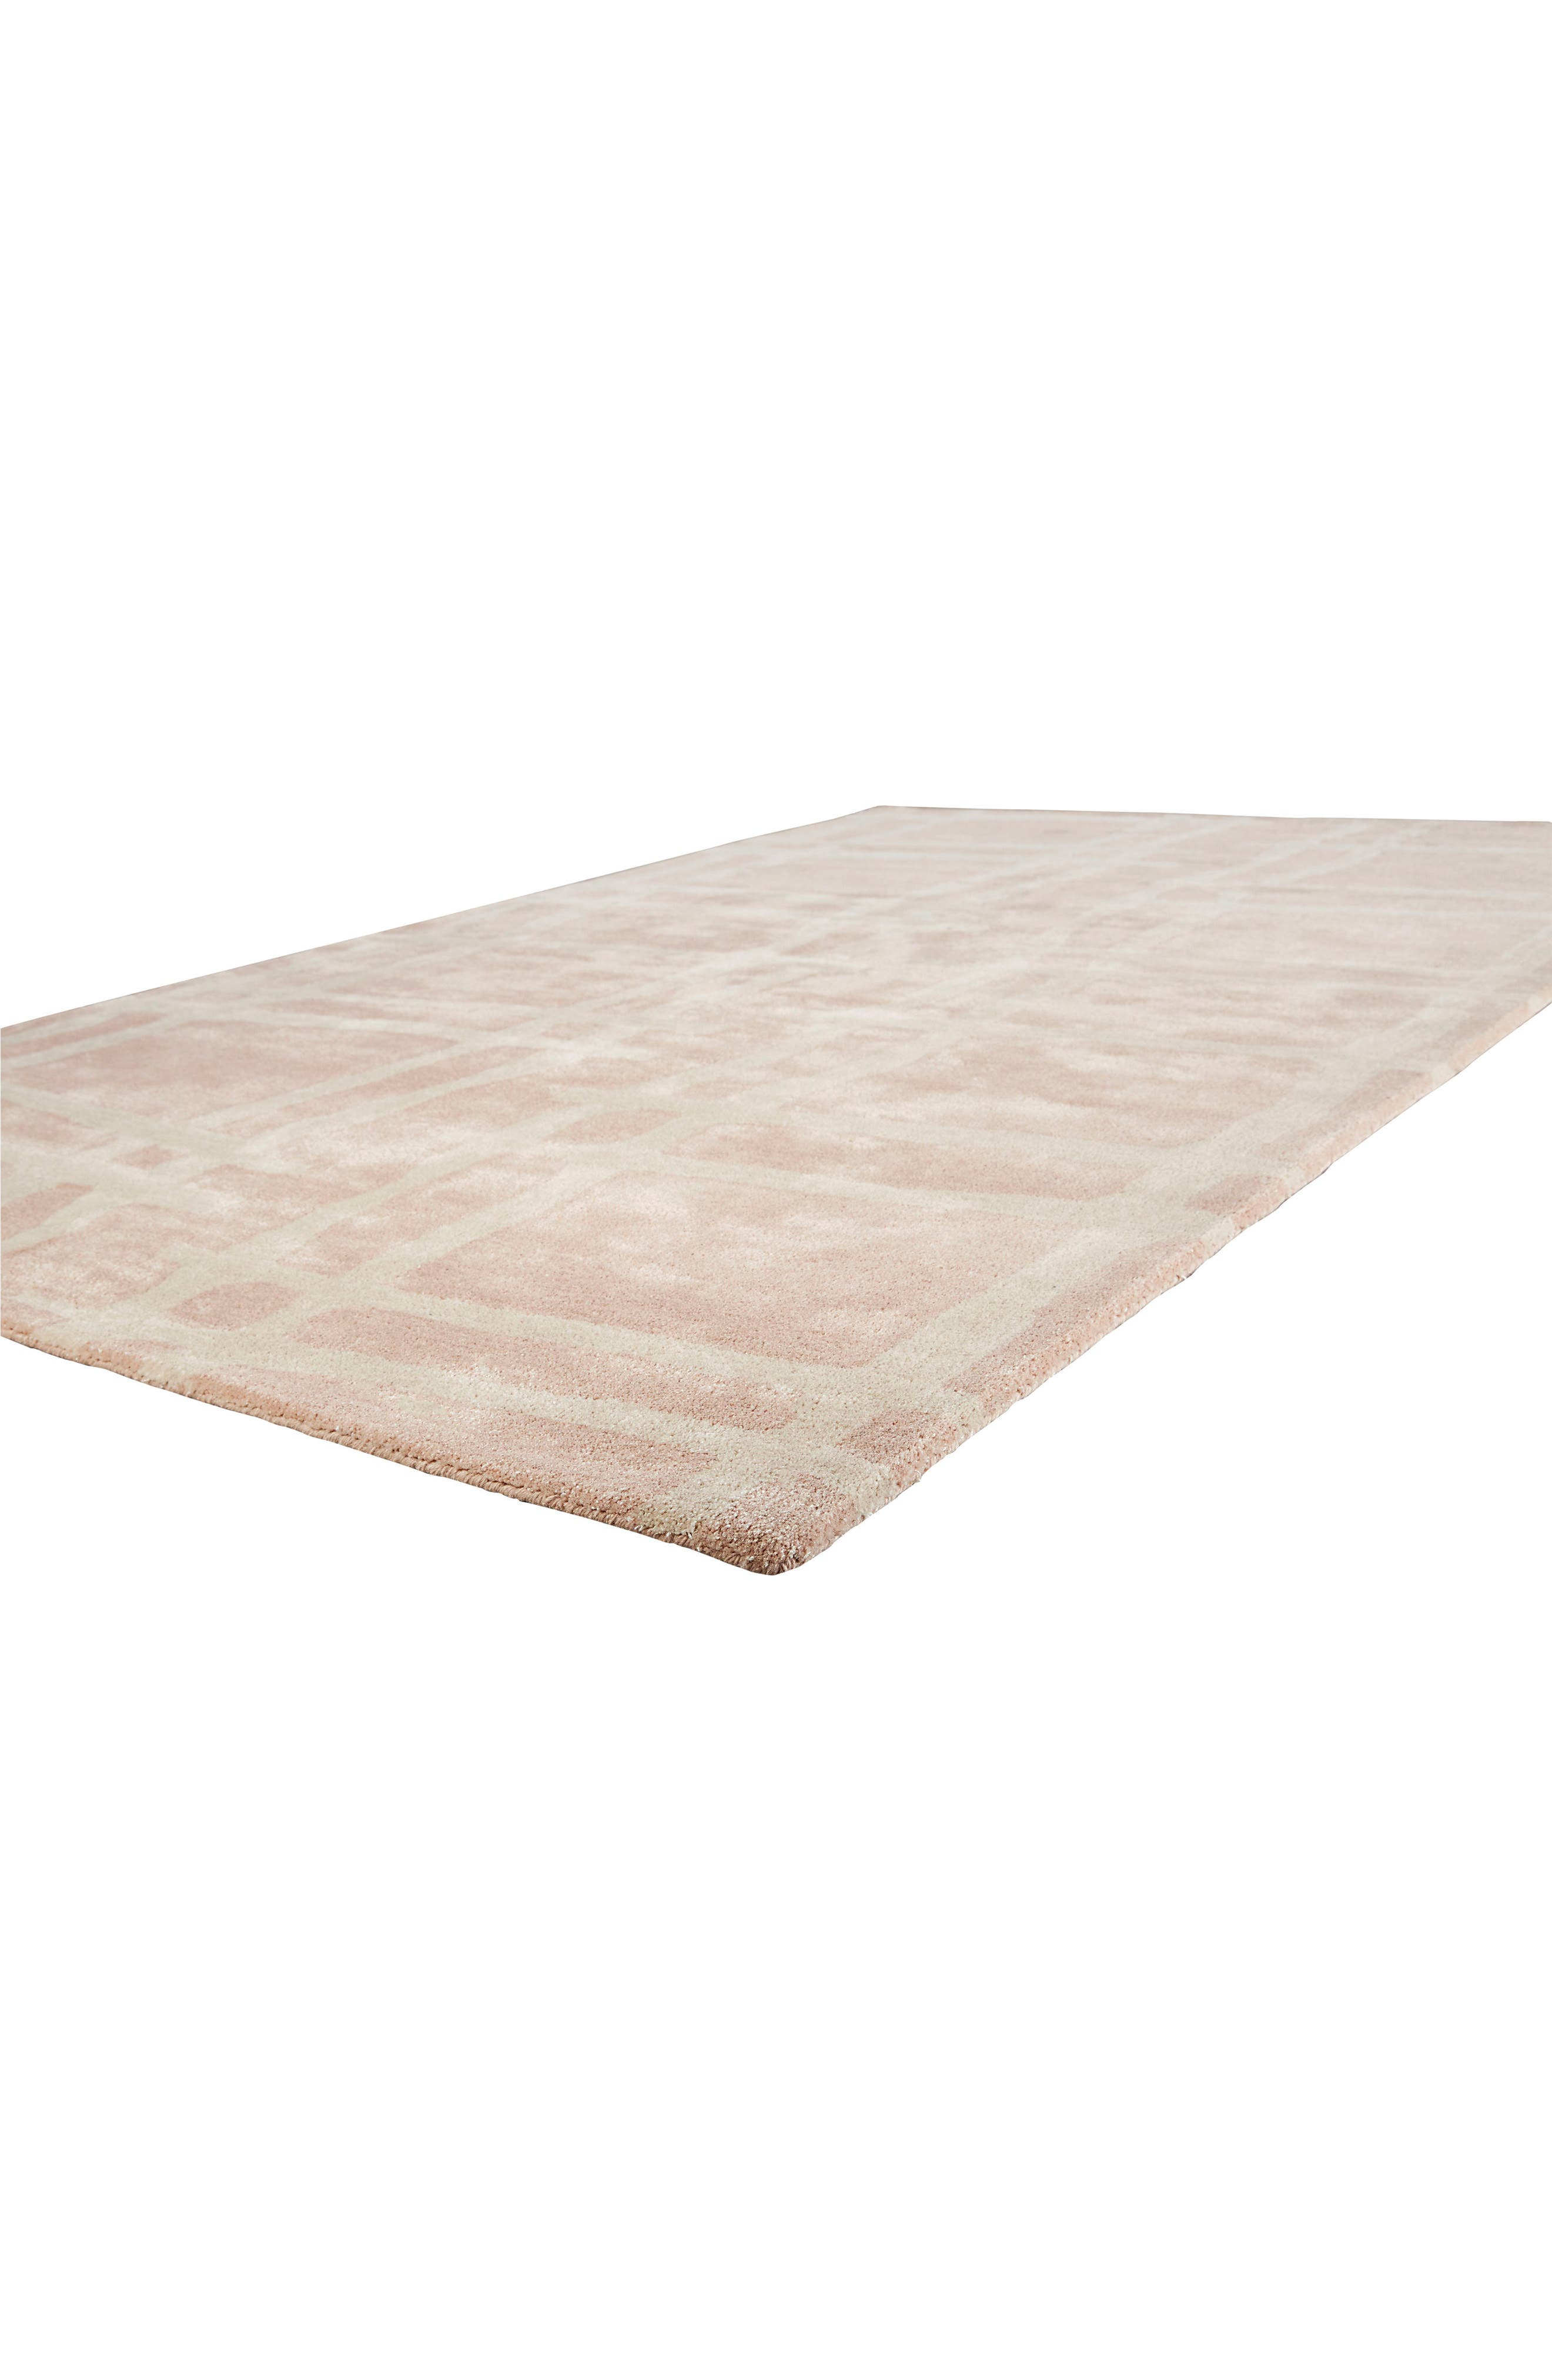 broken plaid rug,                             Alternate thumbnail 2, color,                             650